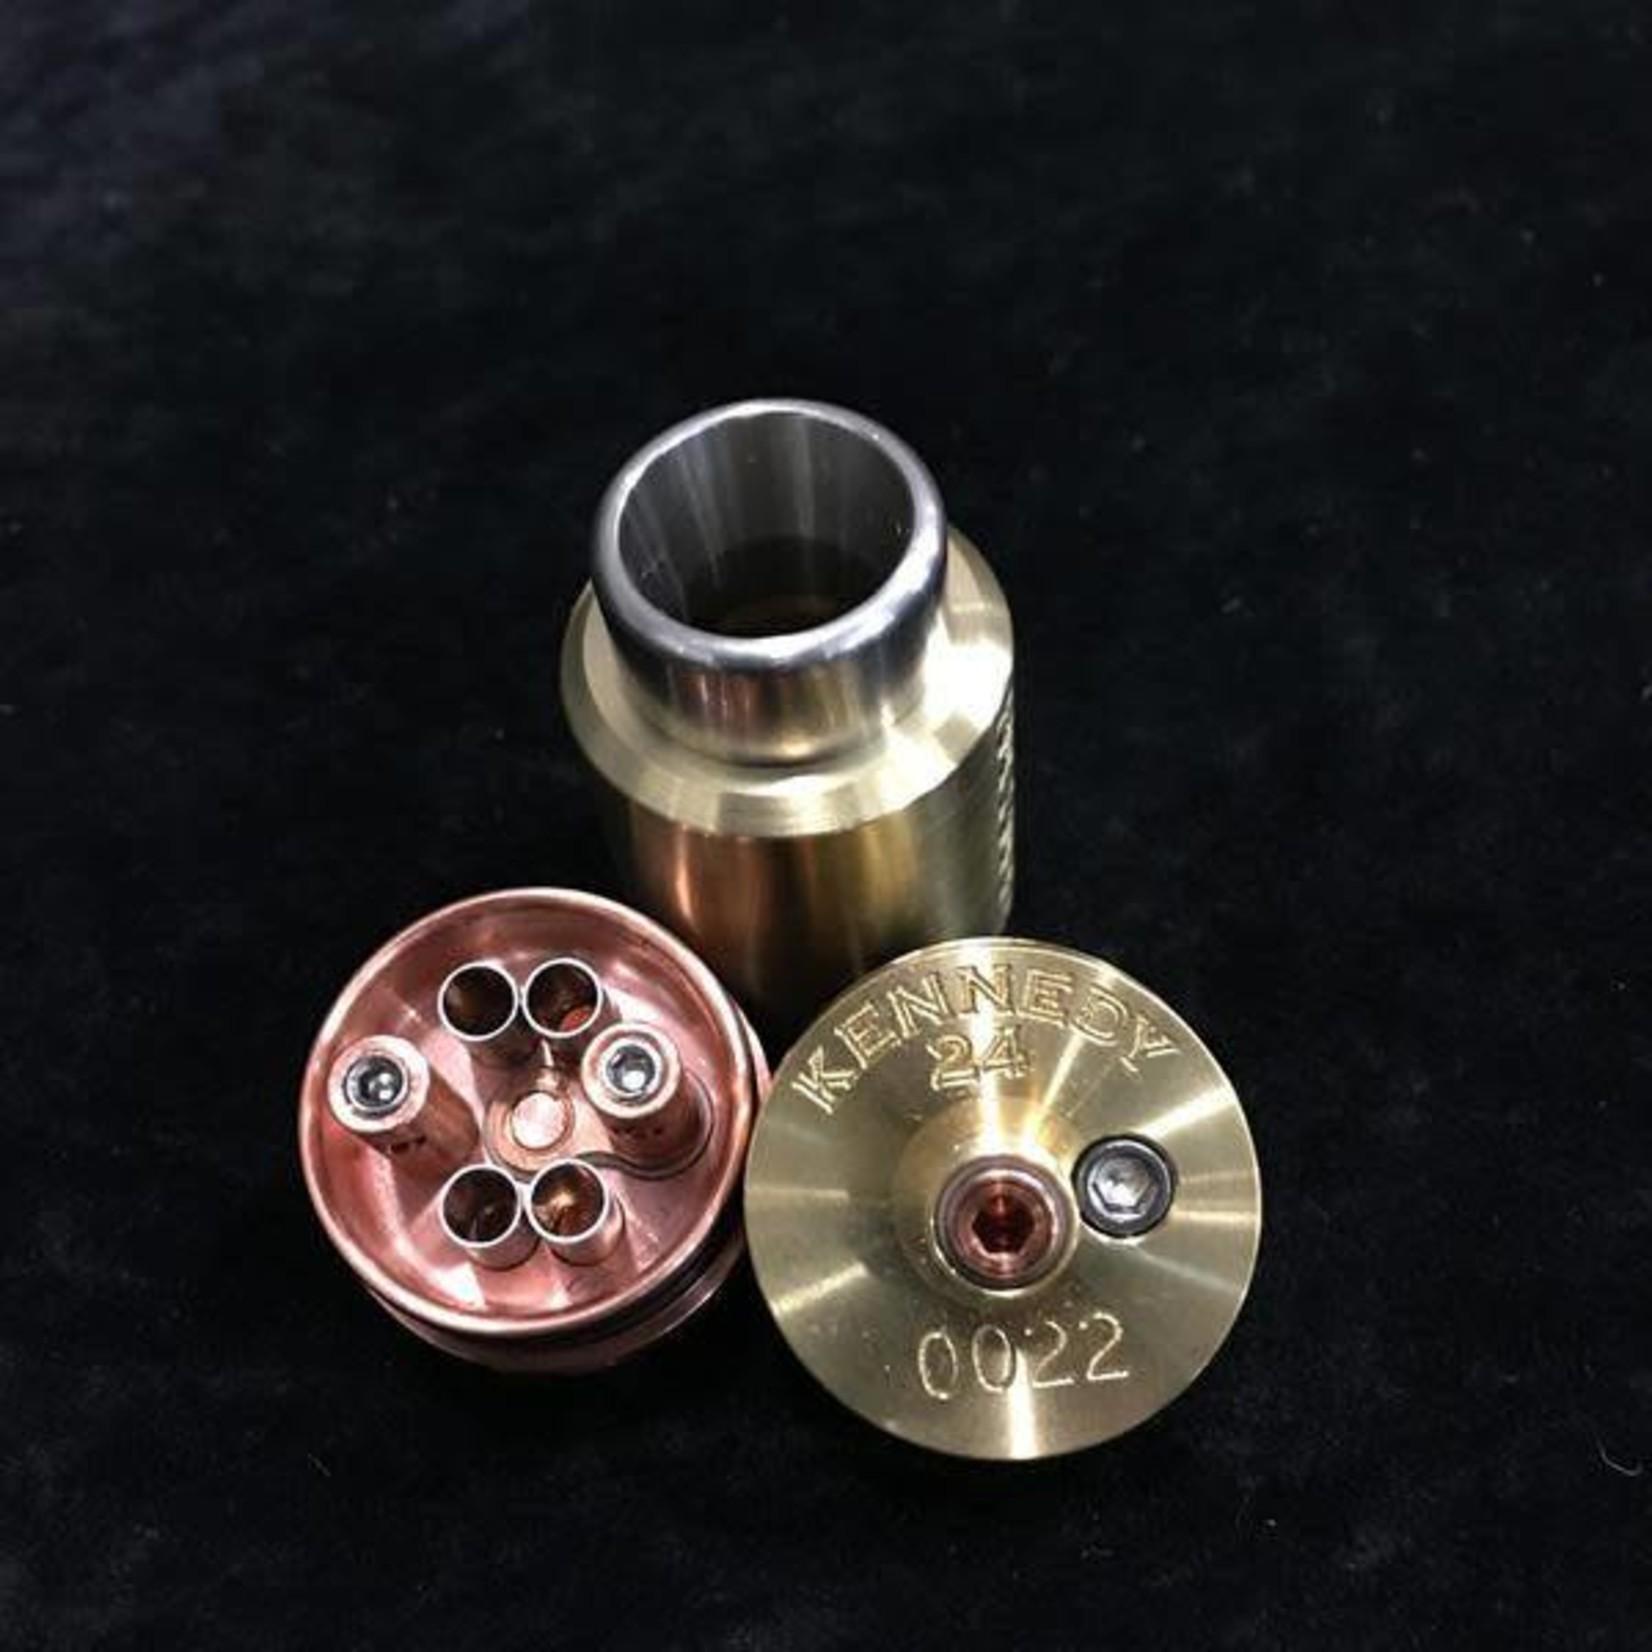 24mm (authentic)